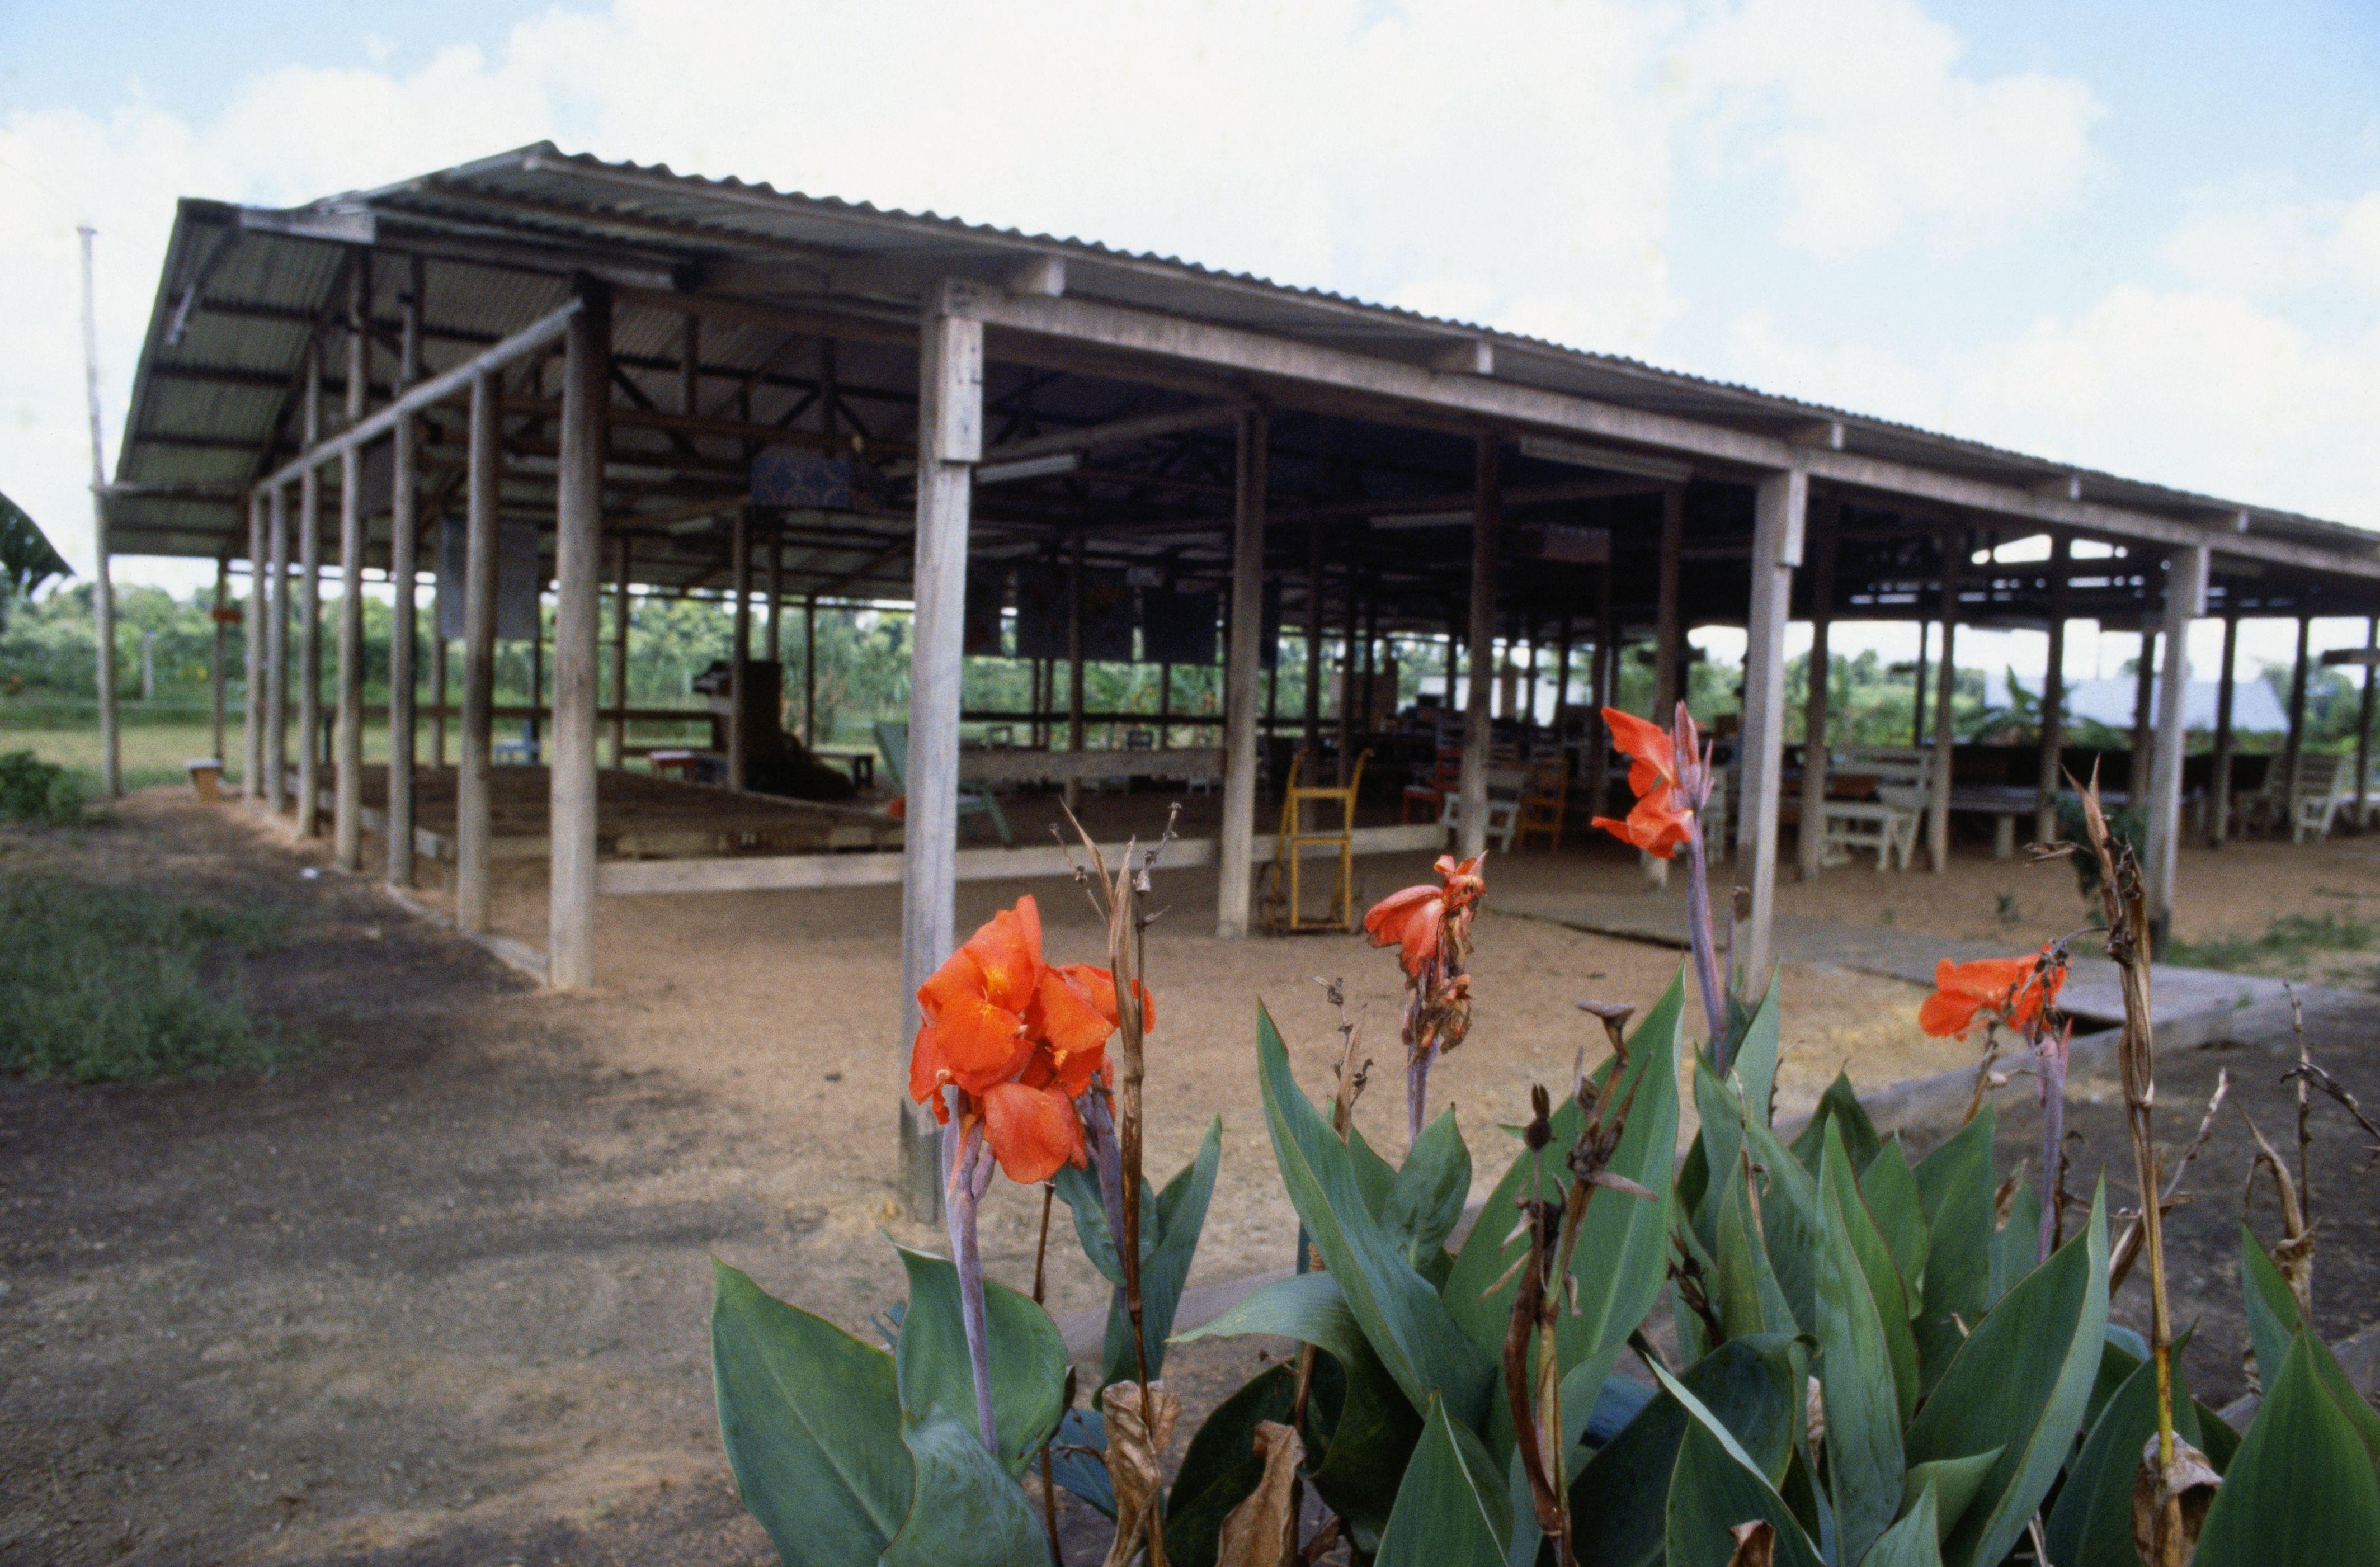 Flowers Growing by abandoned Jonestown Pavilion.